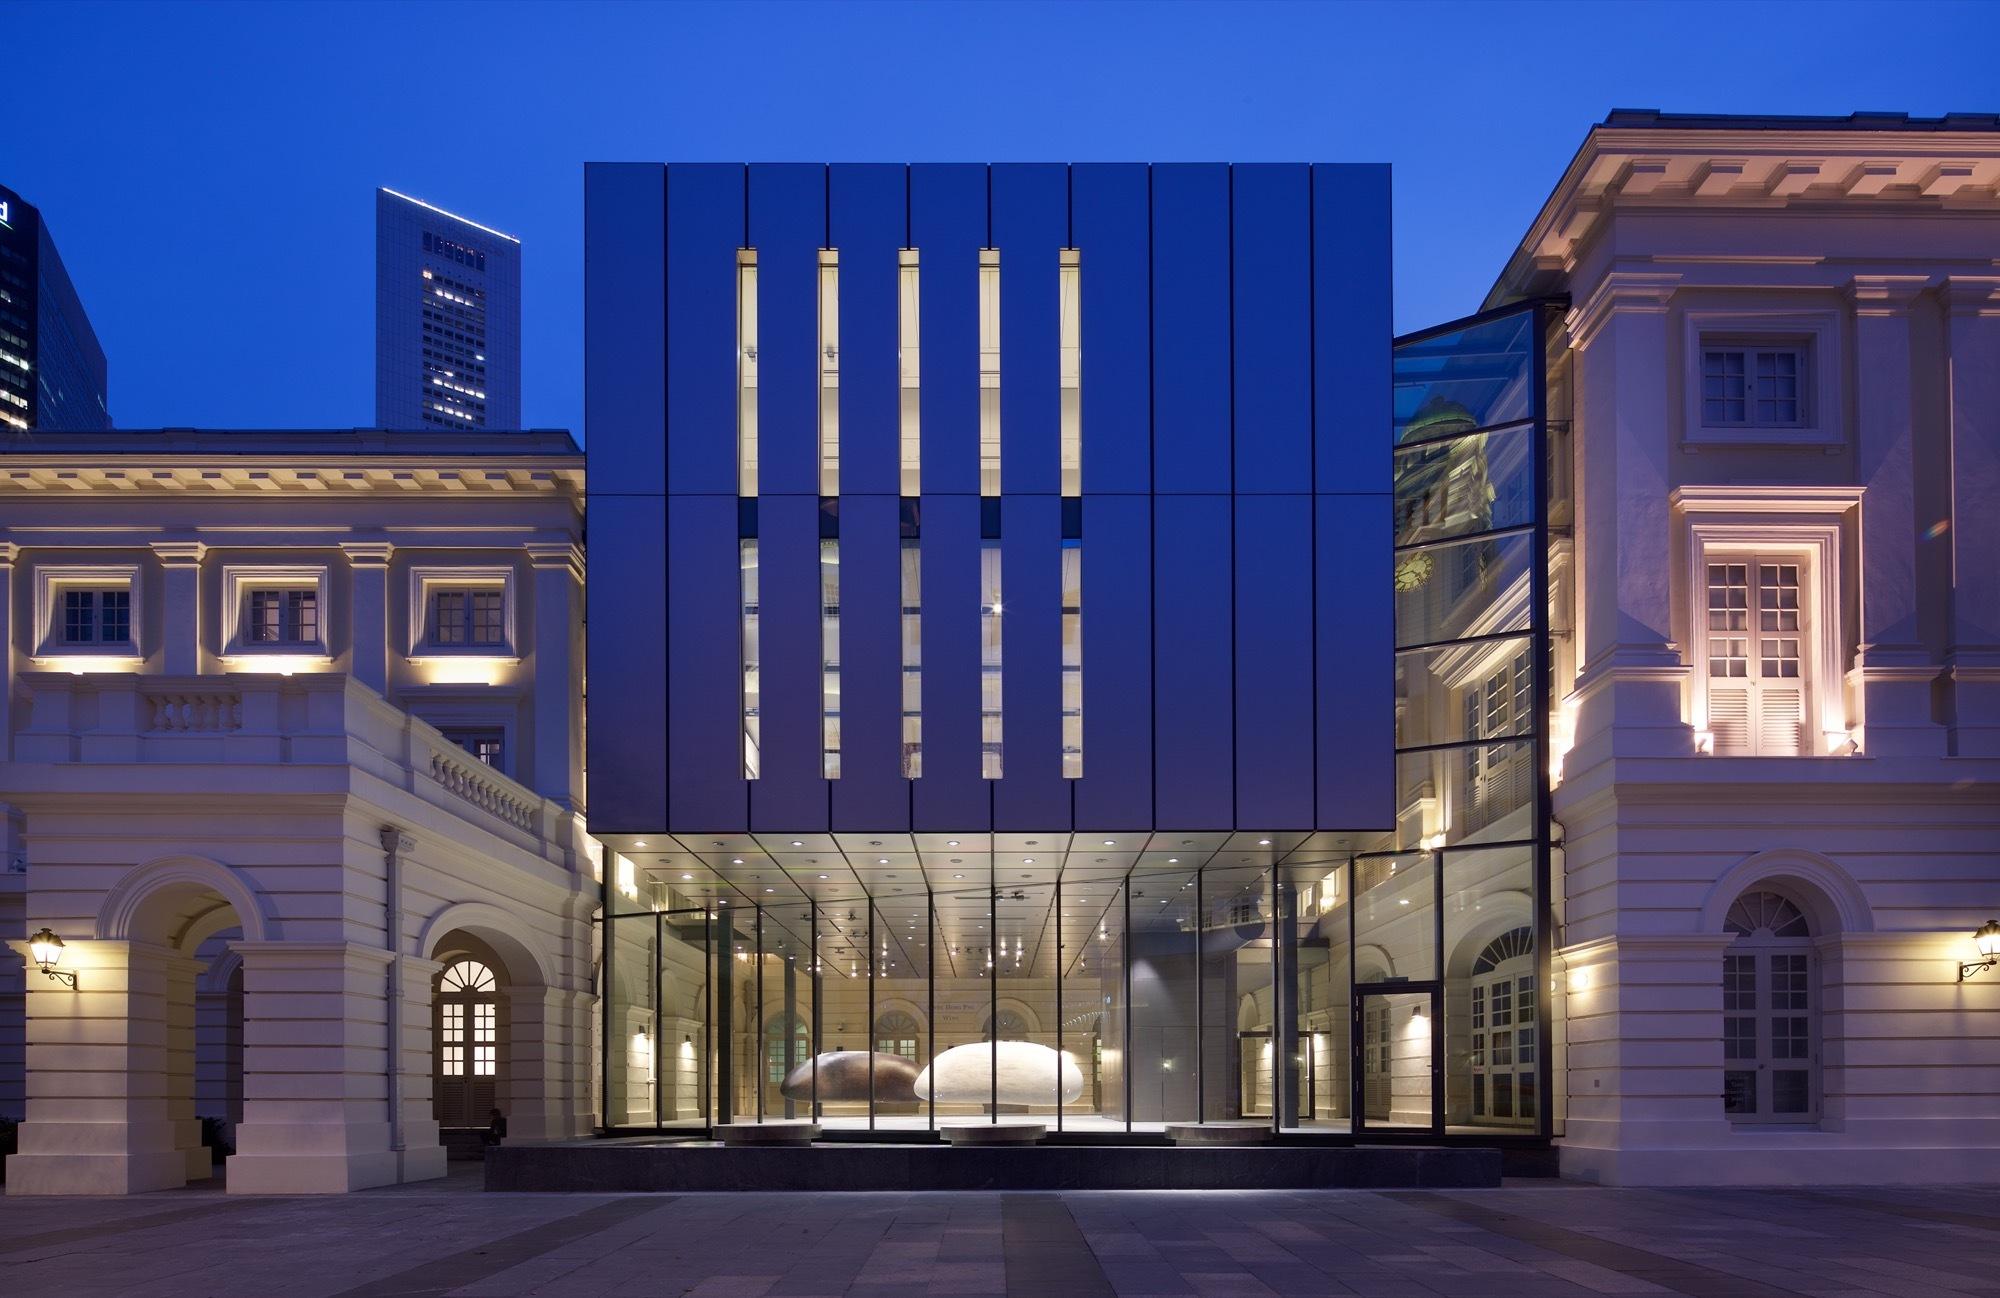 asiatisches zivilisationsmuseum in singapur